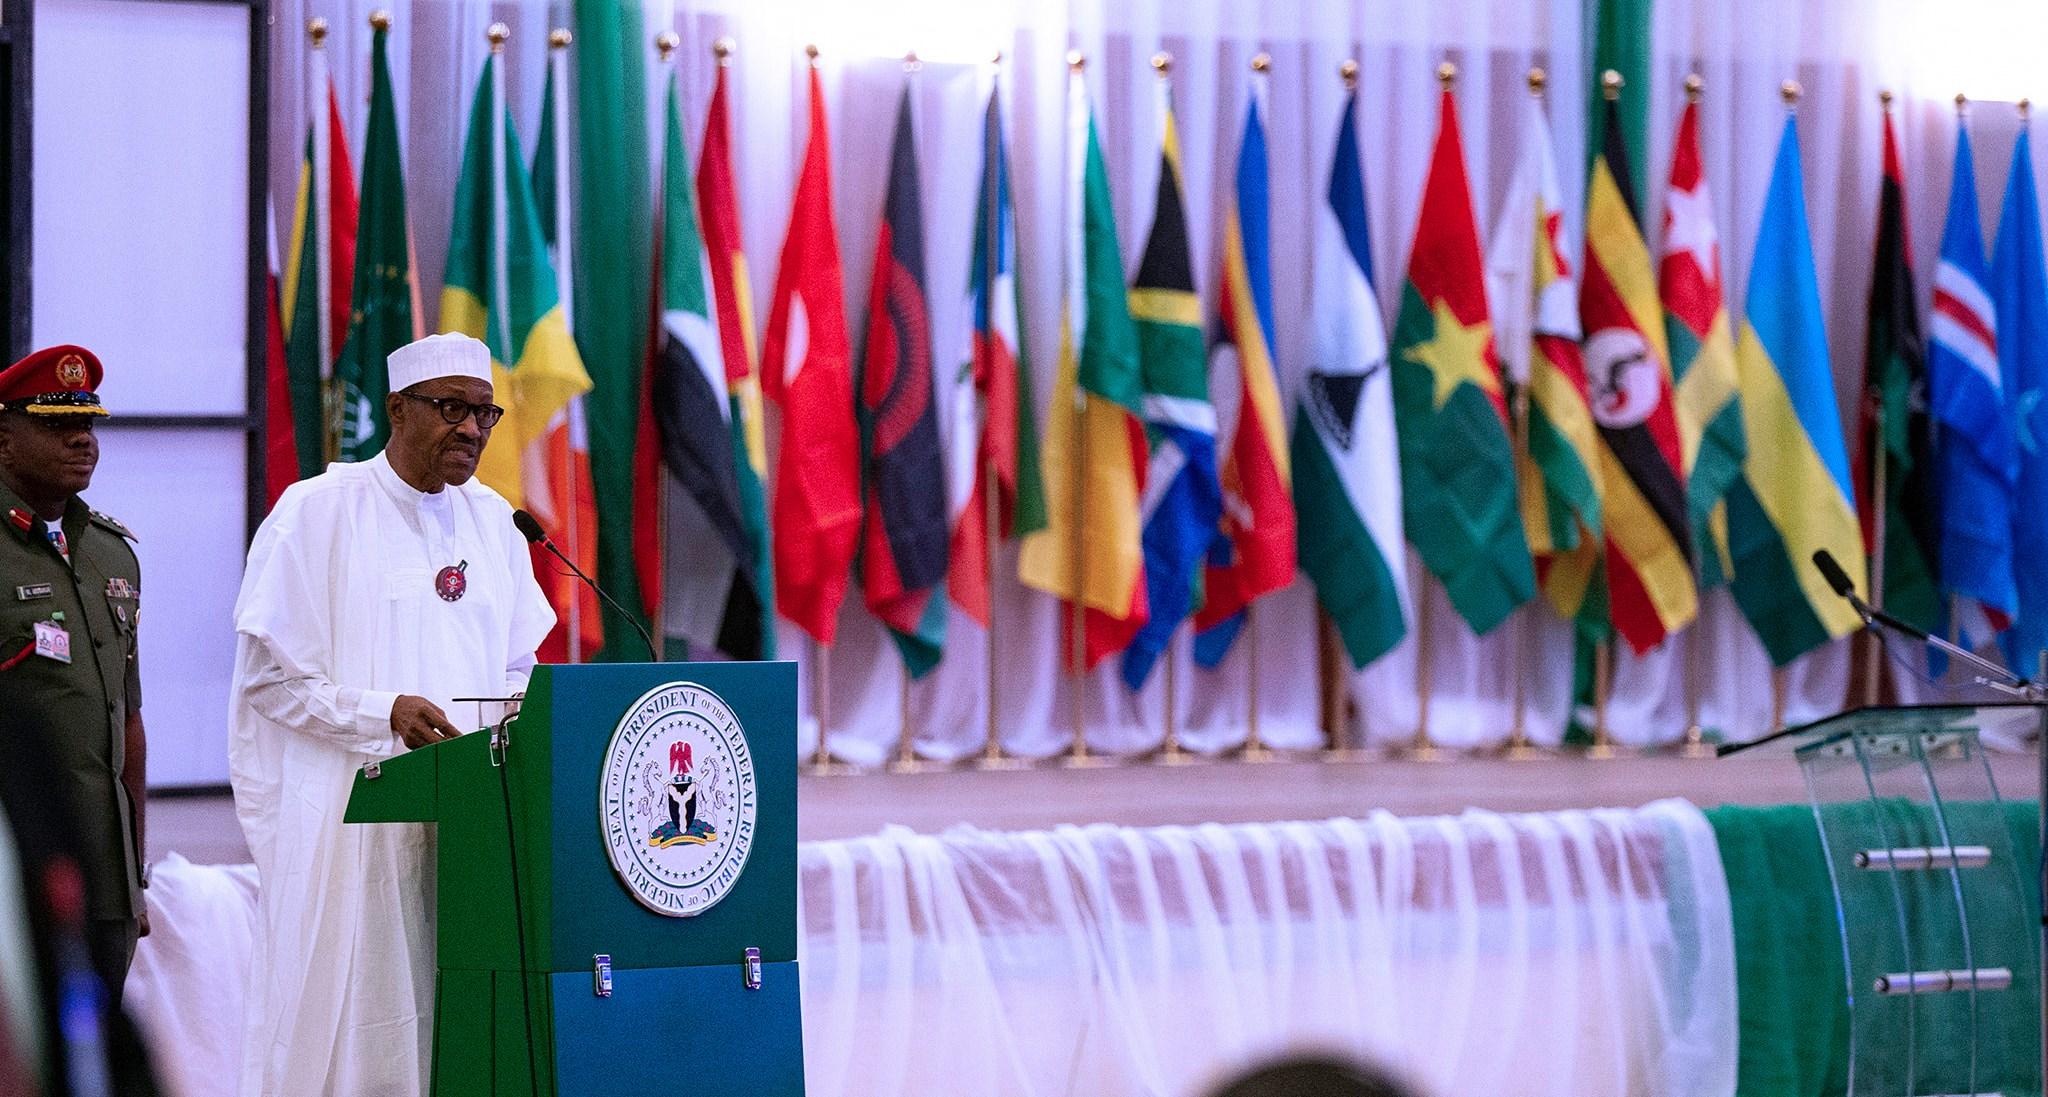 President Buhari Launches Congress Against Corruption